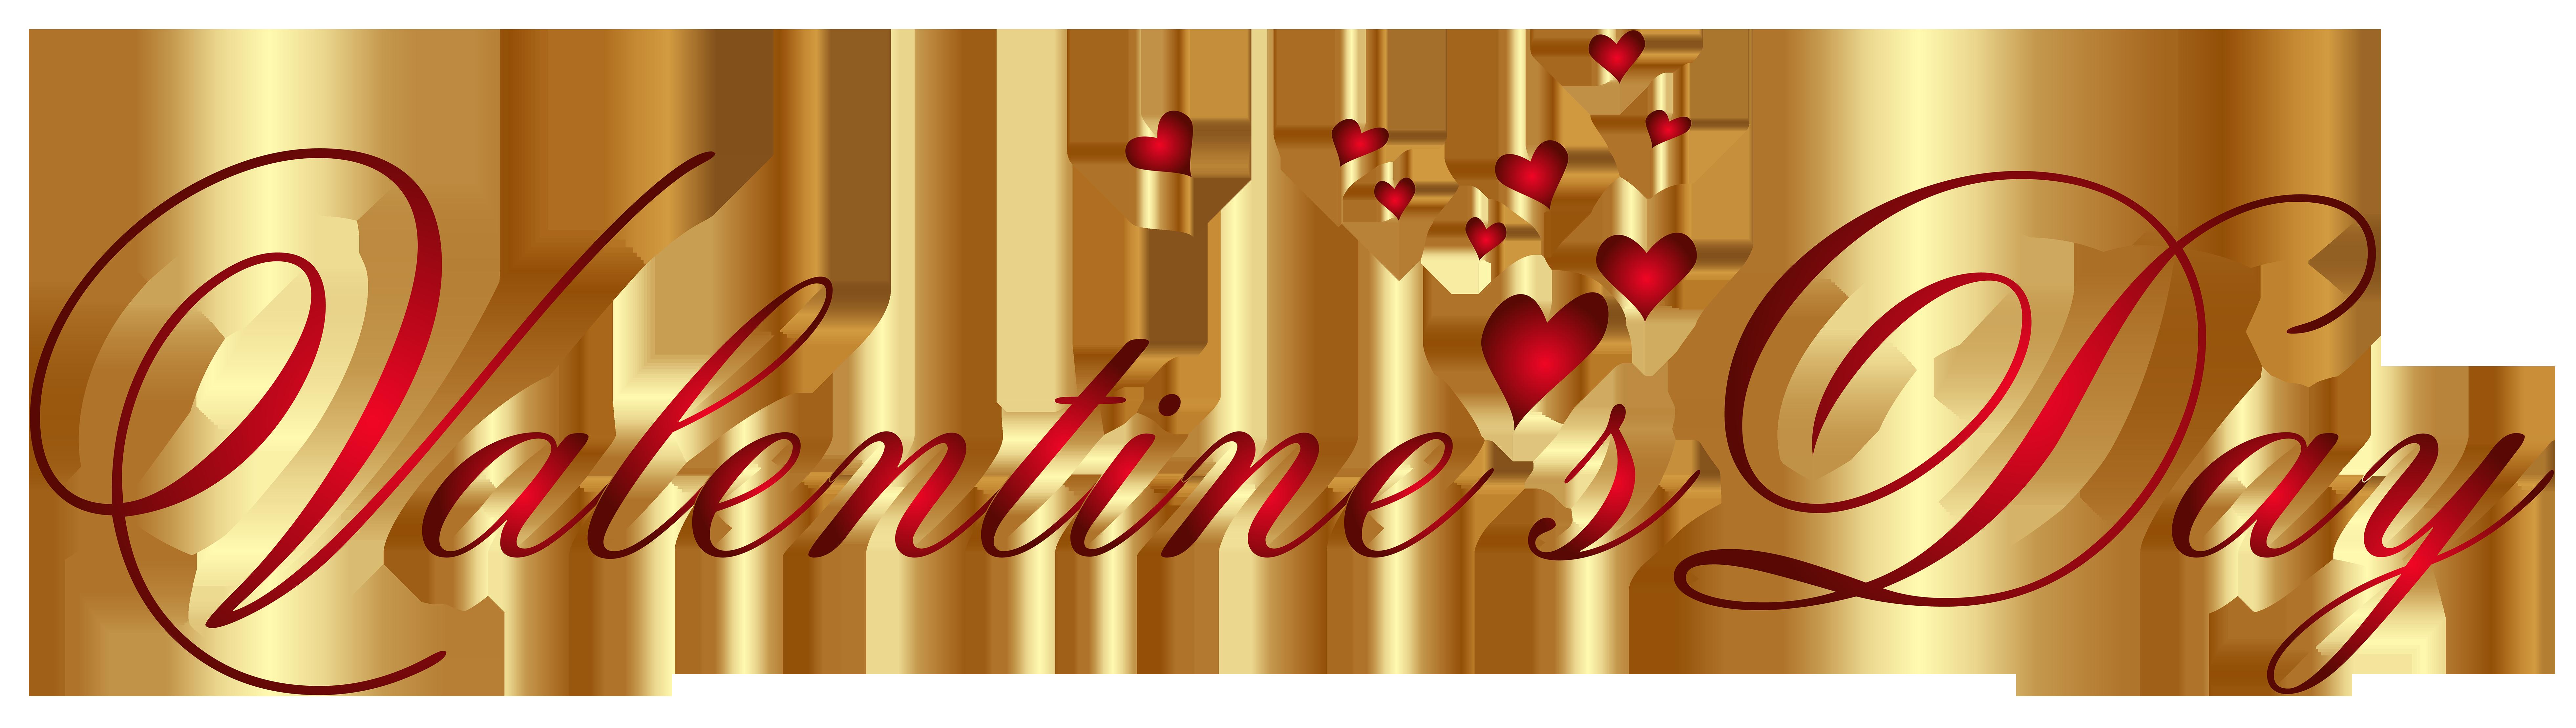 Valentine s day transparent. Football clipart valentines